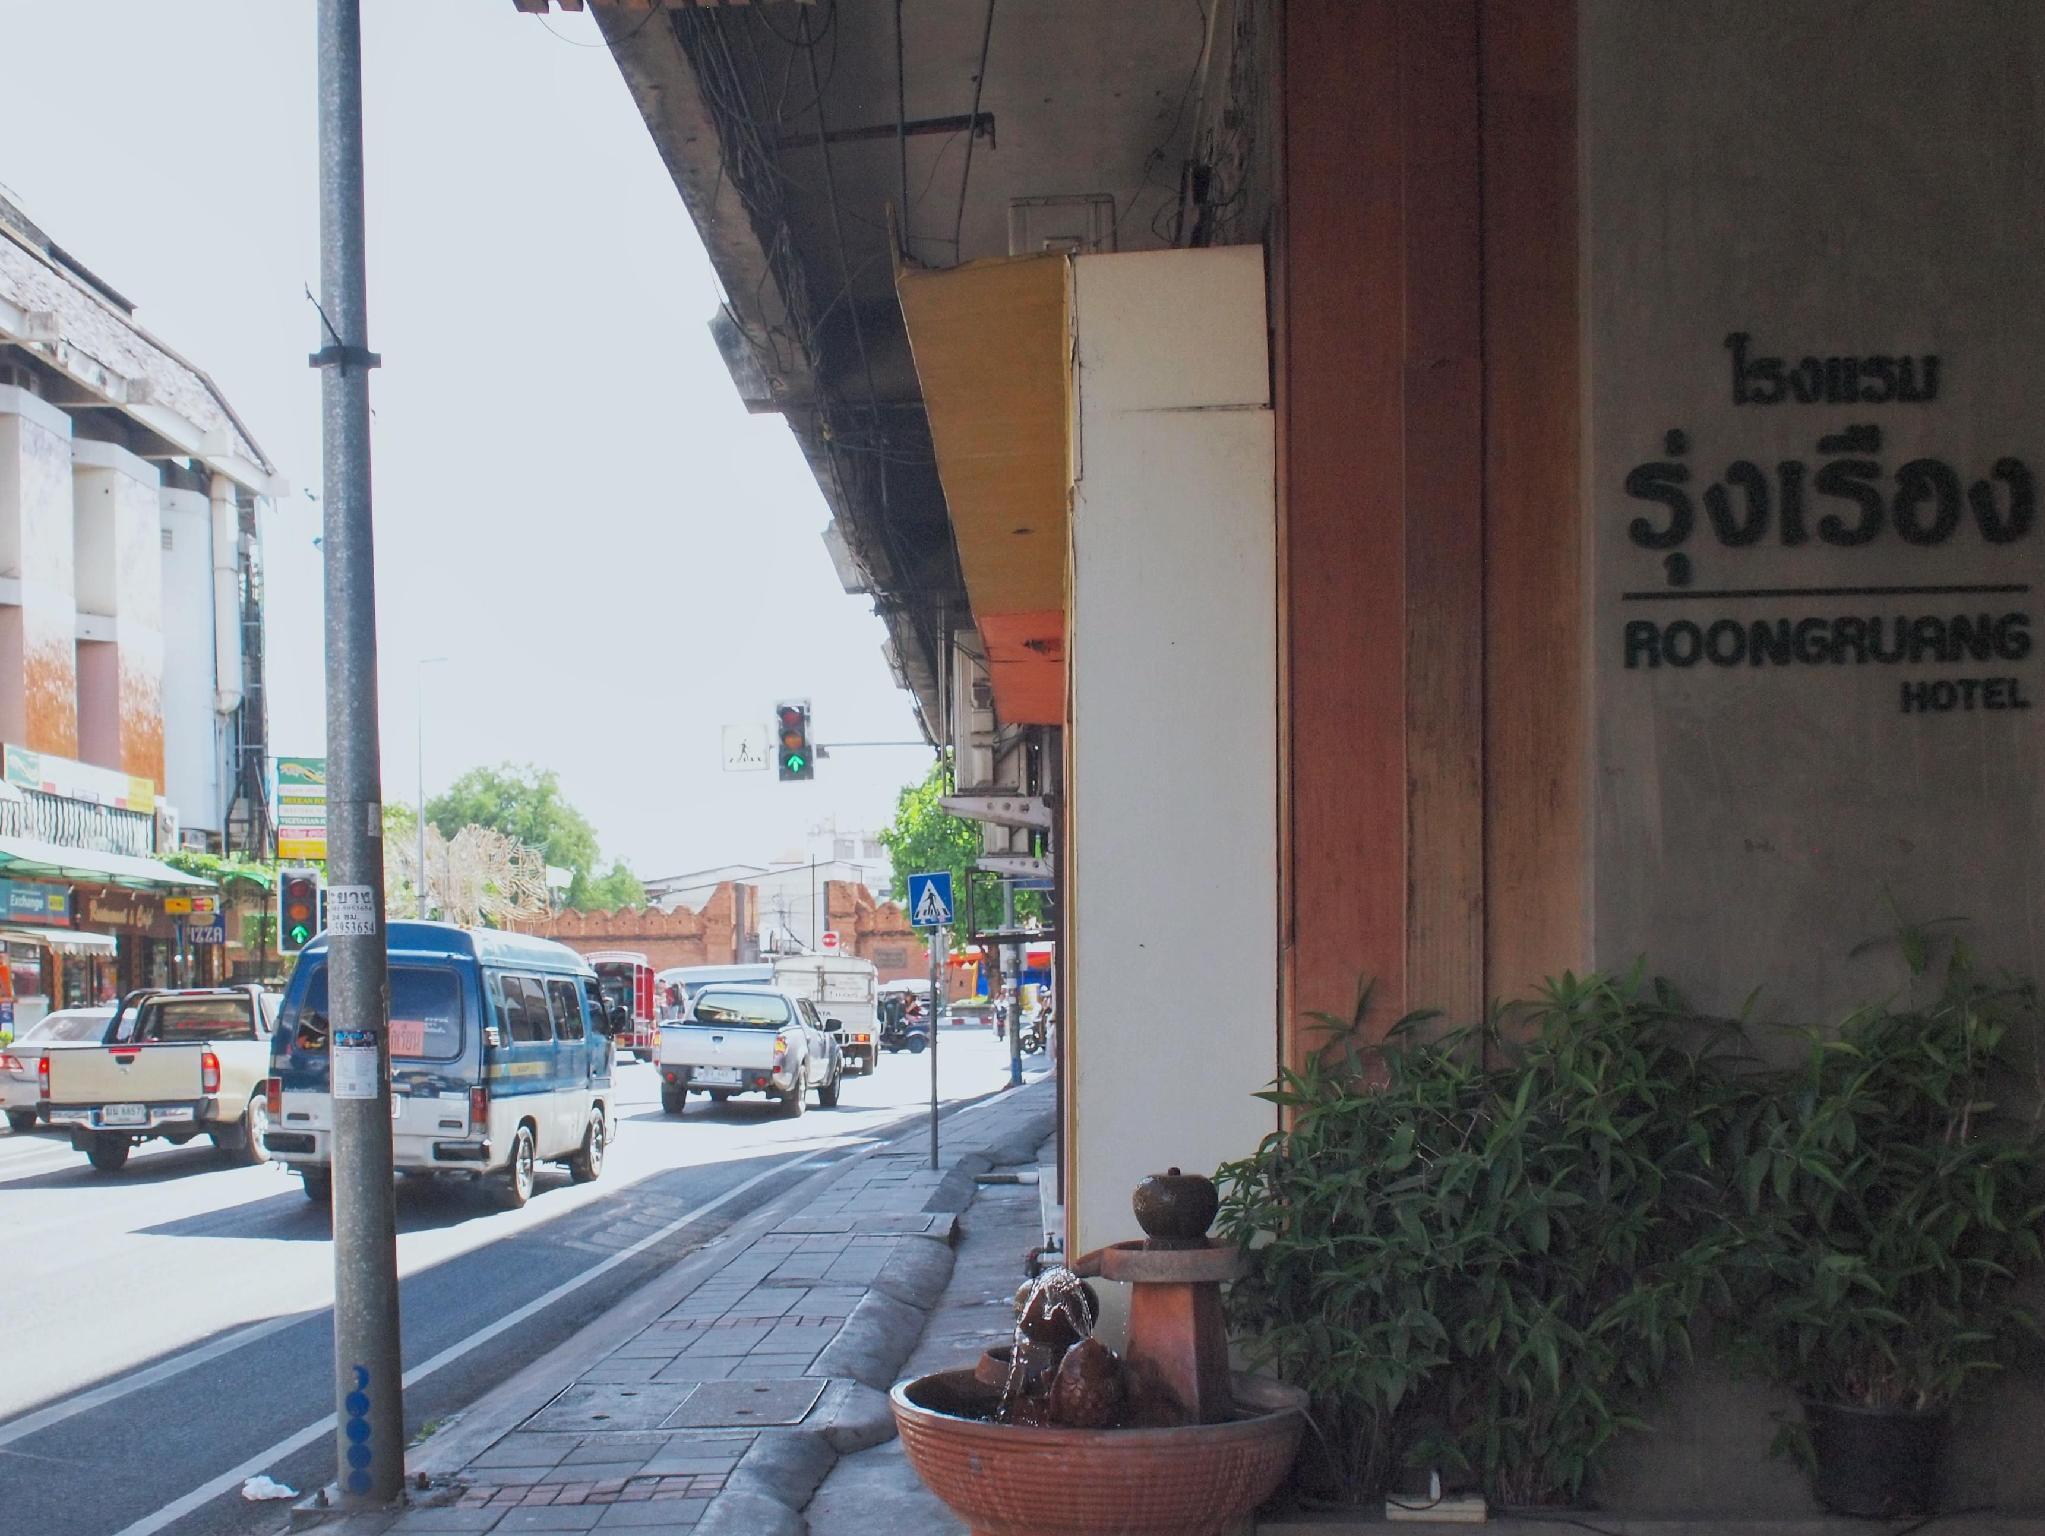 Roongruang Hotel โรงแรมรุ่งเรือง